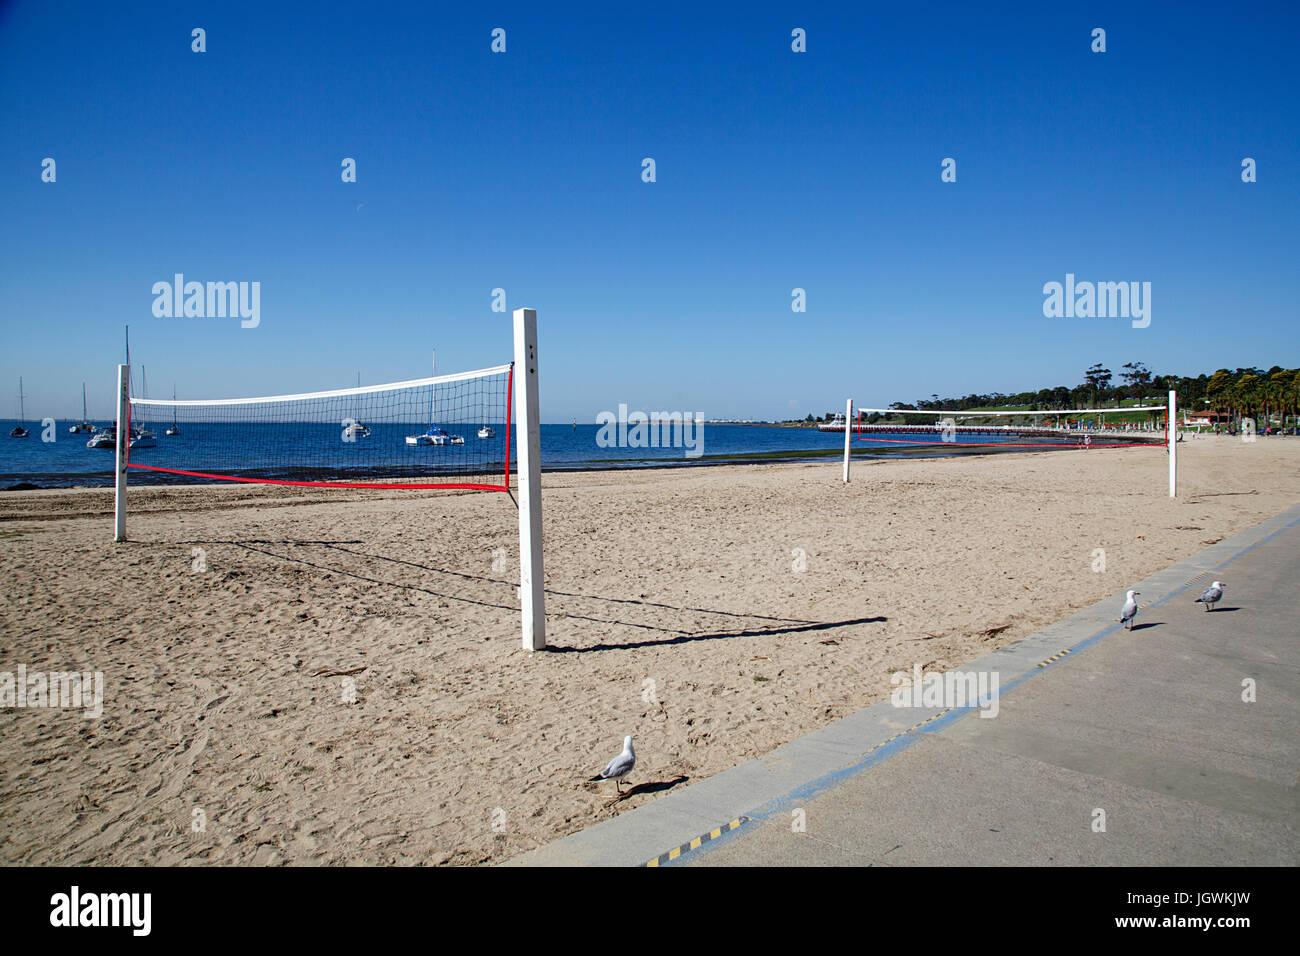 Cancha de volley ball Imagen De Stock